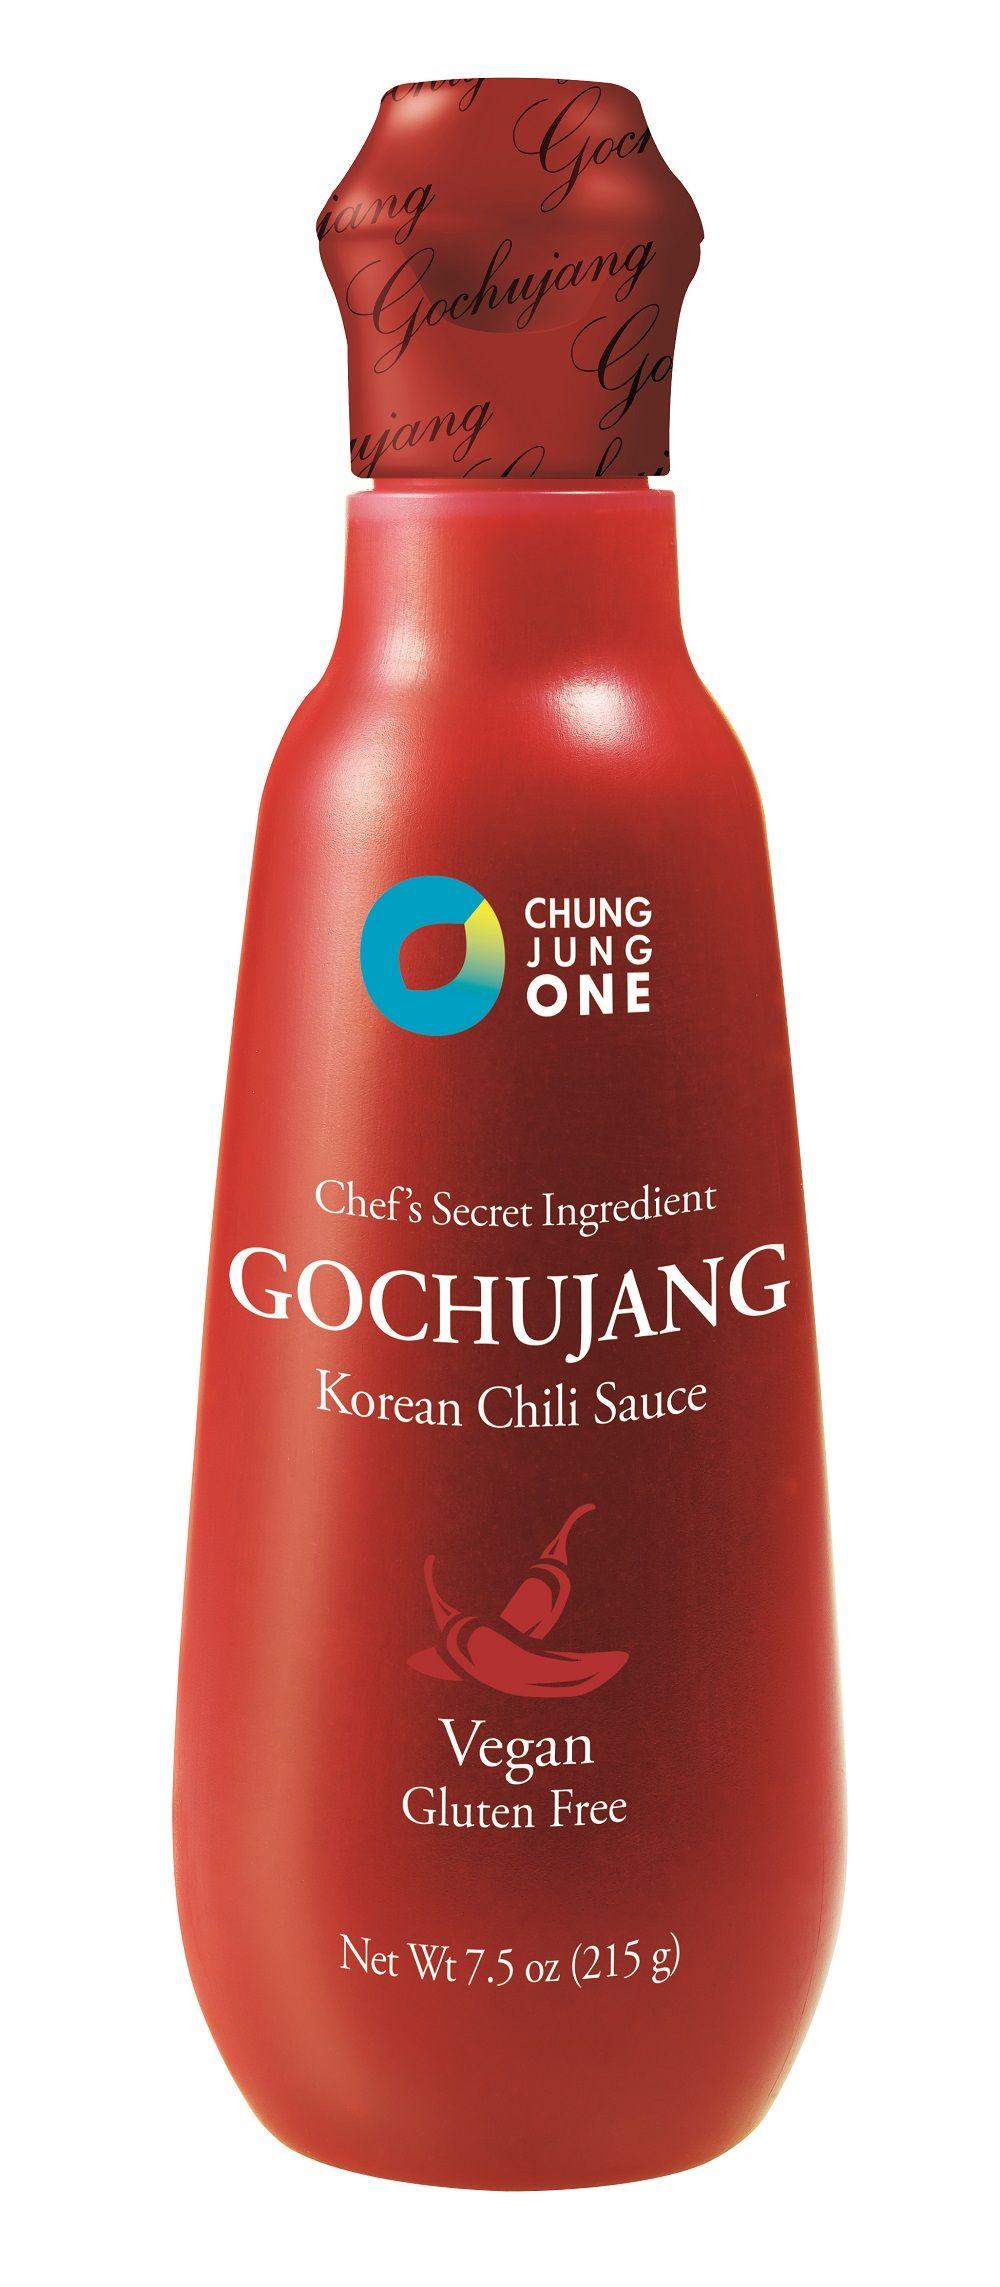 Gochujang Korean Chili Sauce is a traditional fermented